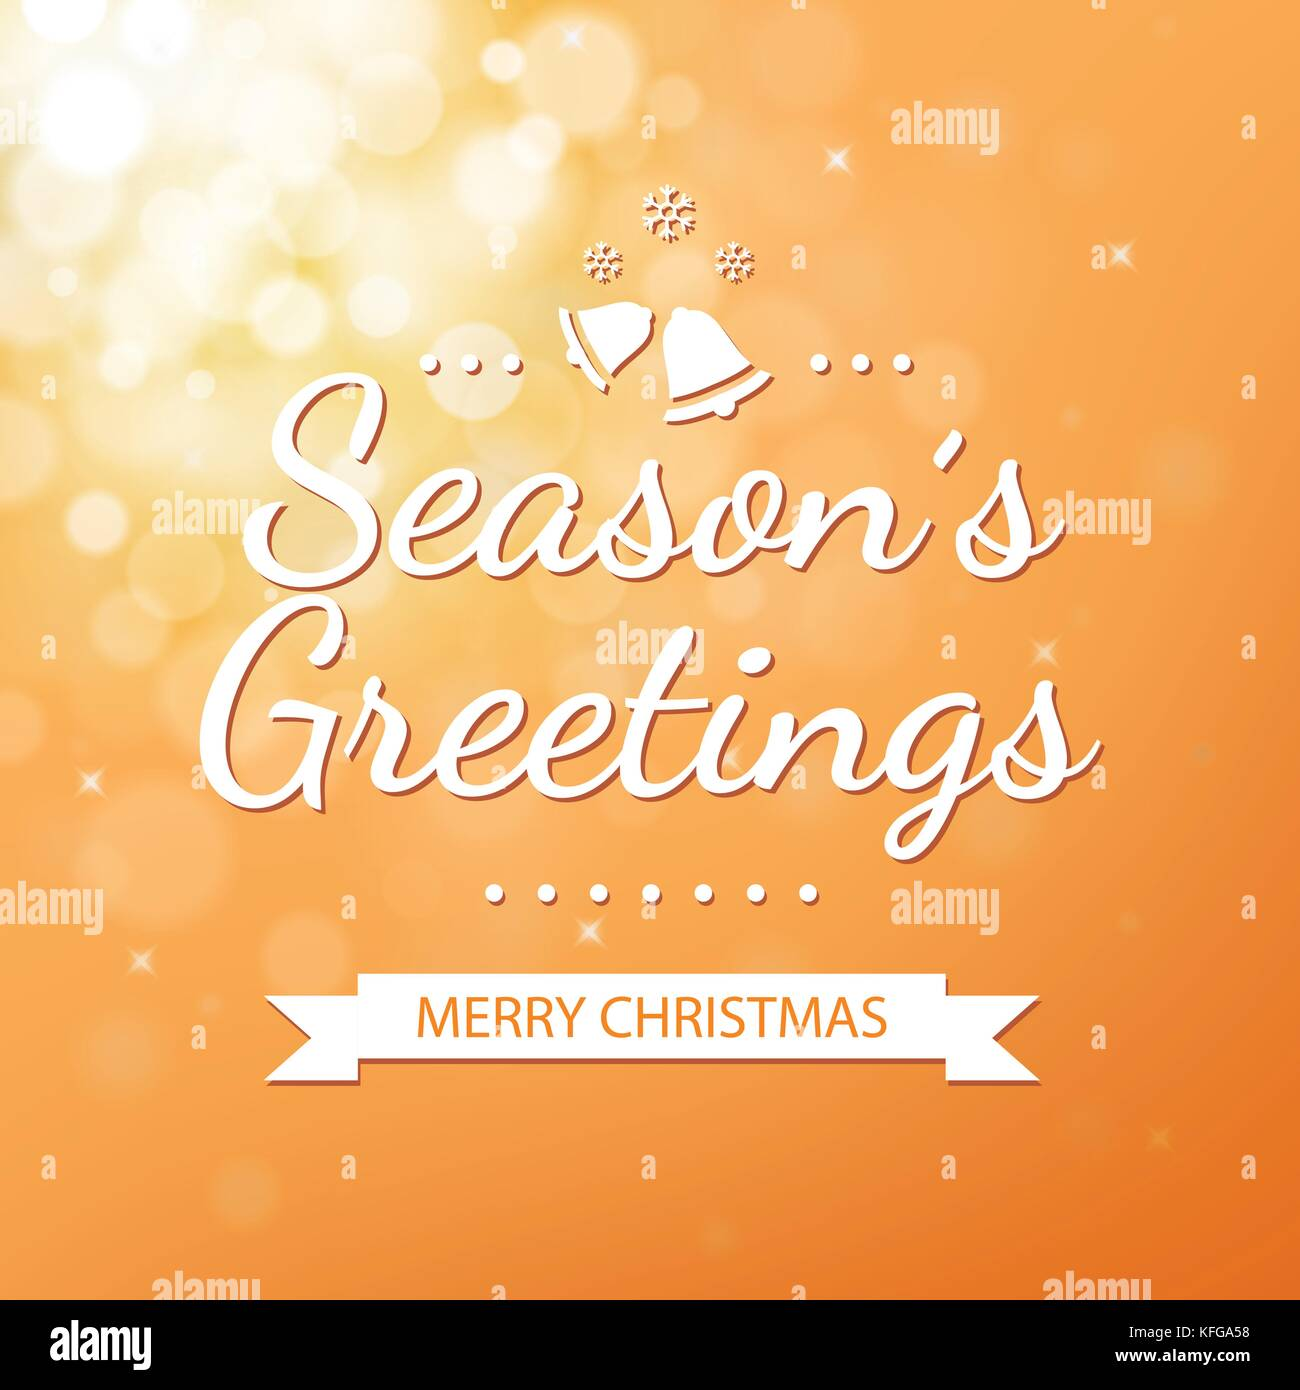 Season Greetings With Gold Bokeh Defocused Background For Christmas